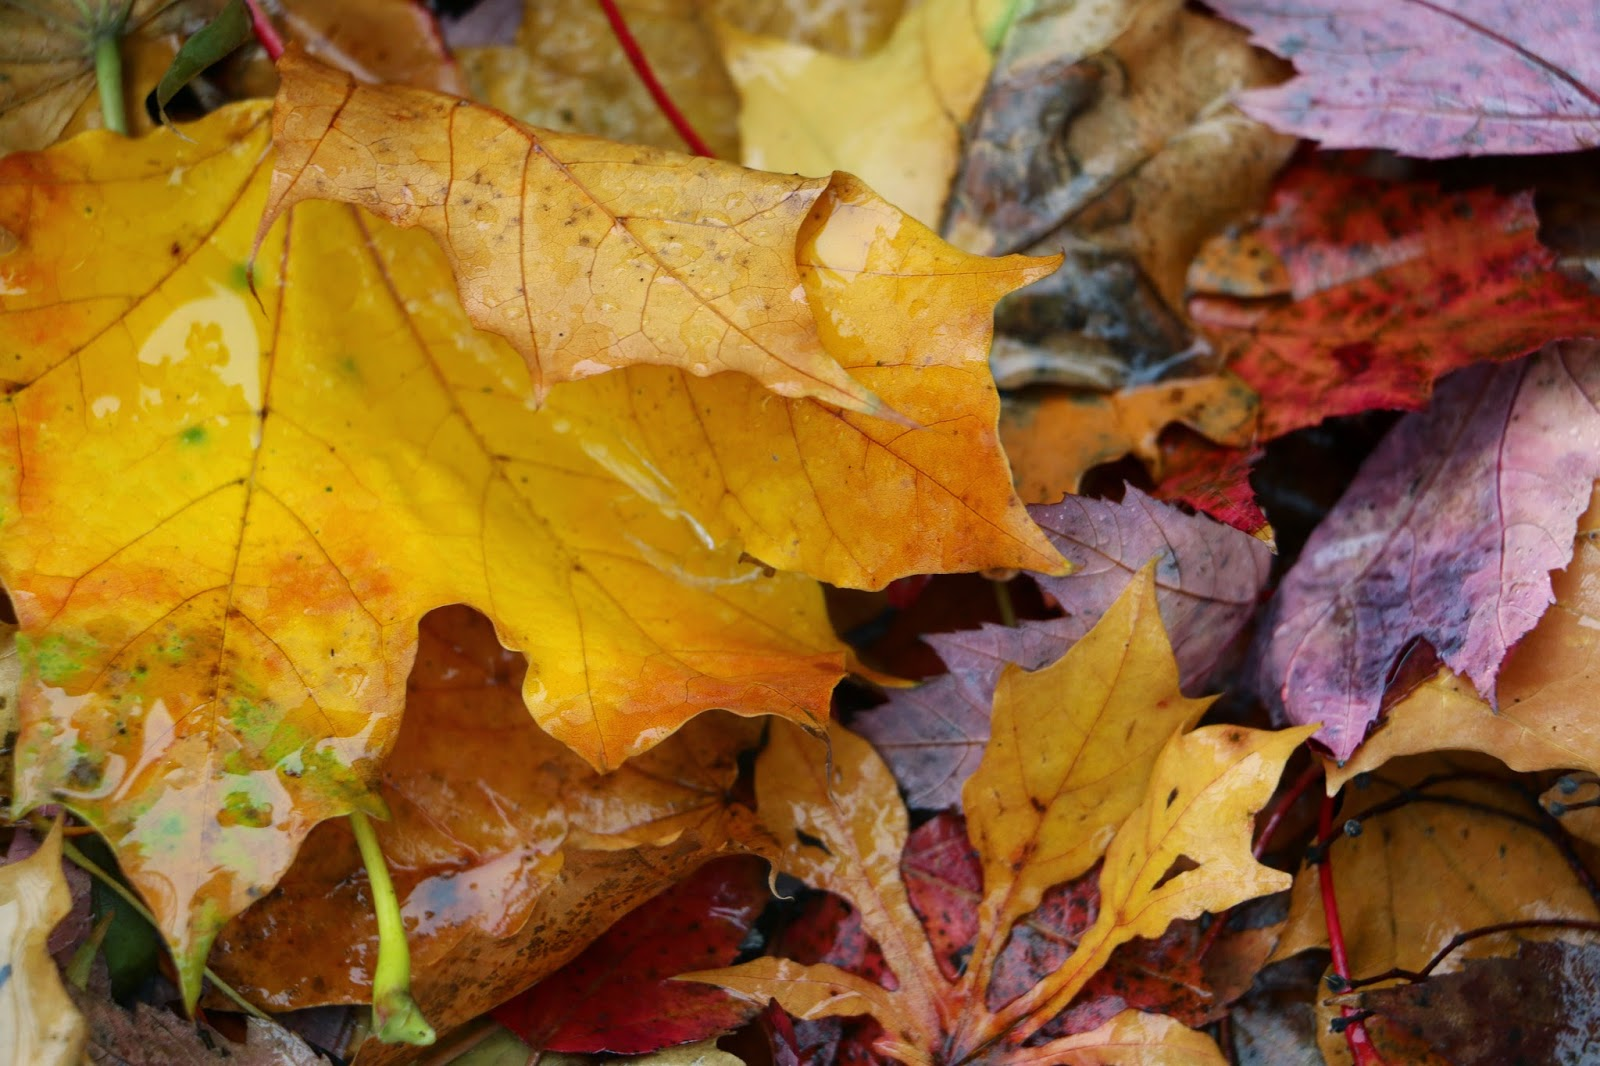 """Les Feuilles d'Automne...The Fall Leavess'-2d Photo Shahrzad Ghaffari MVM- 21 OCT 2014"